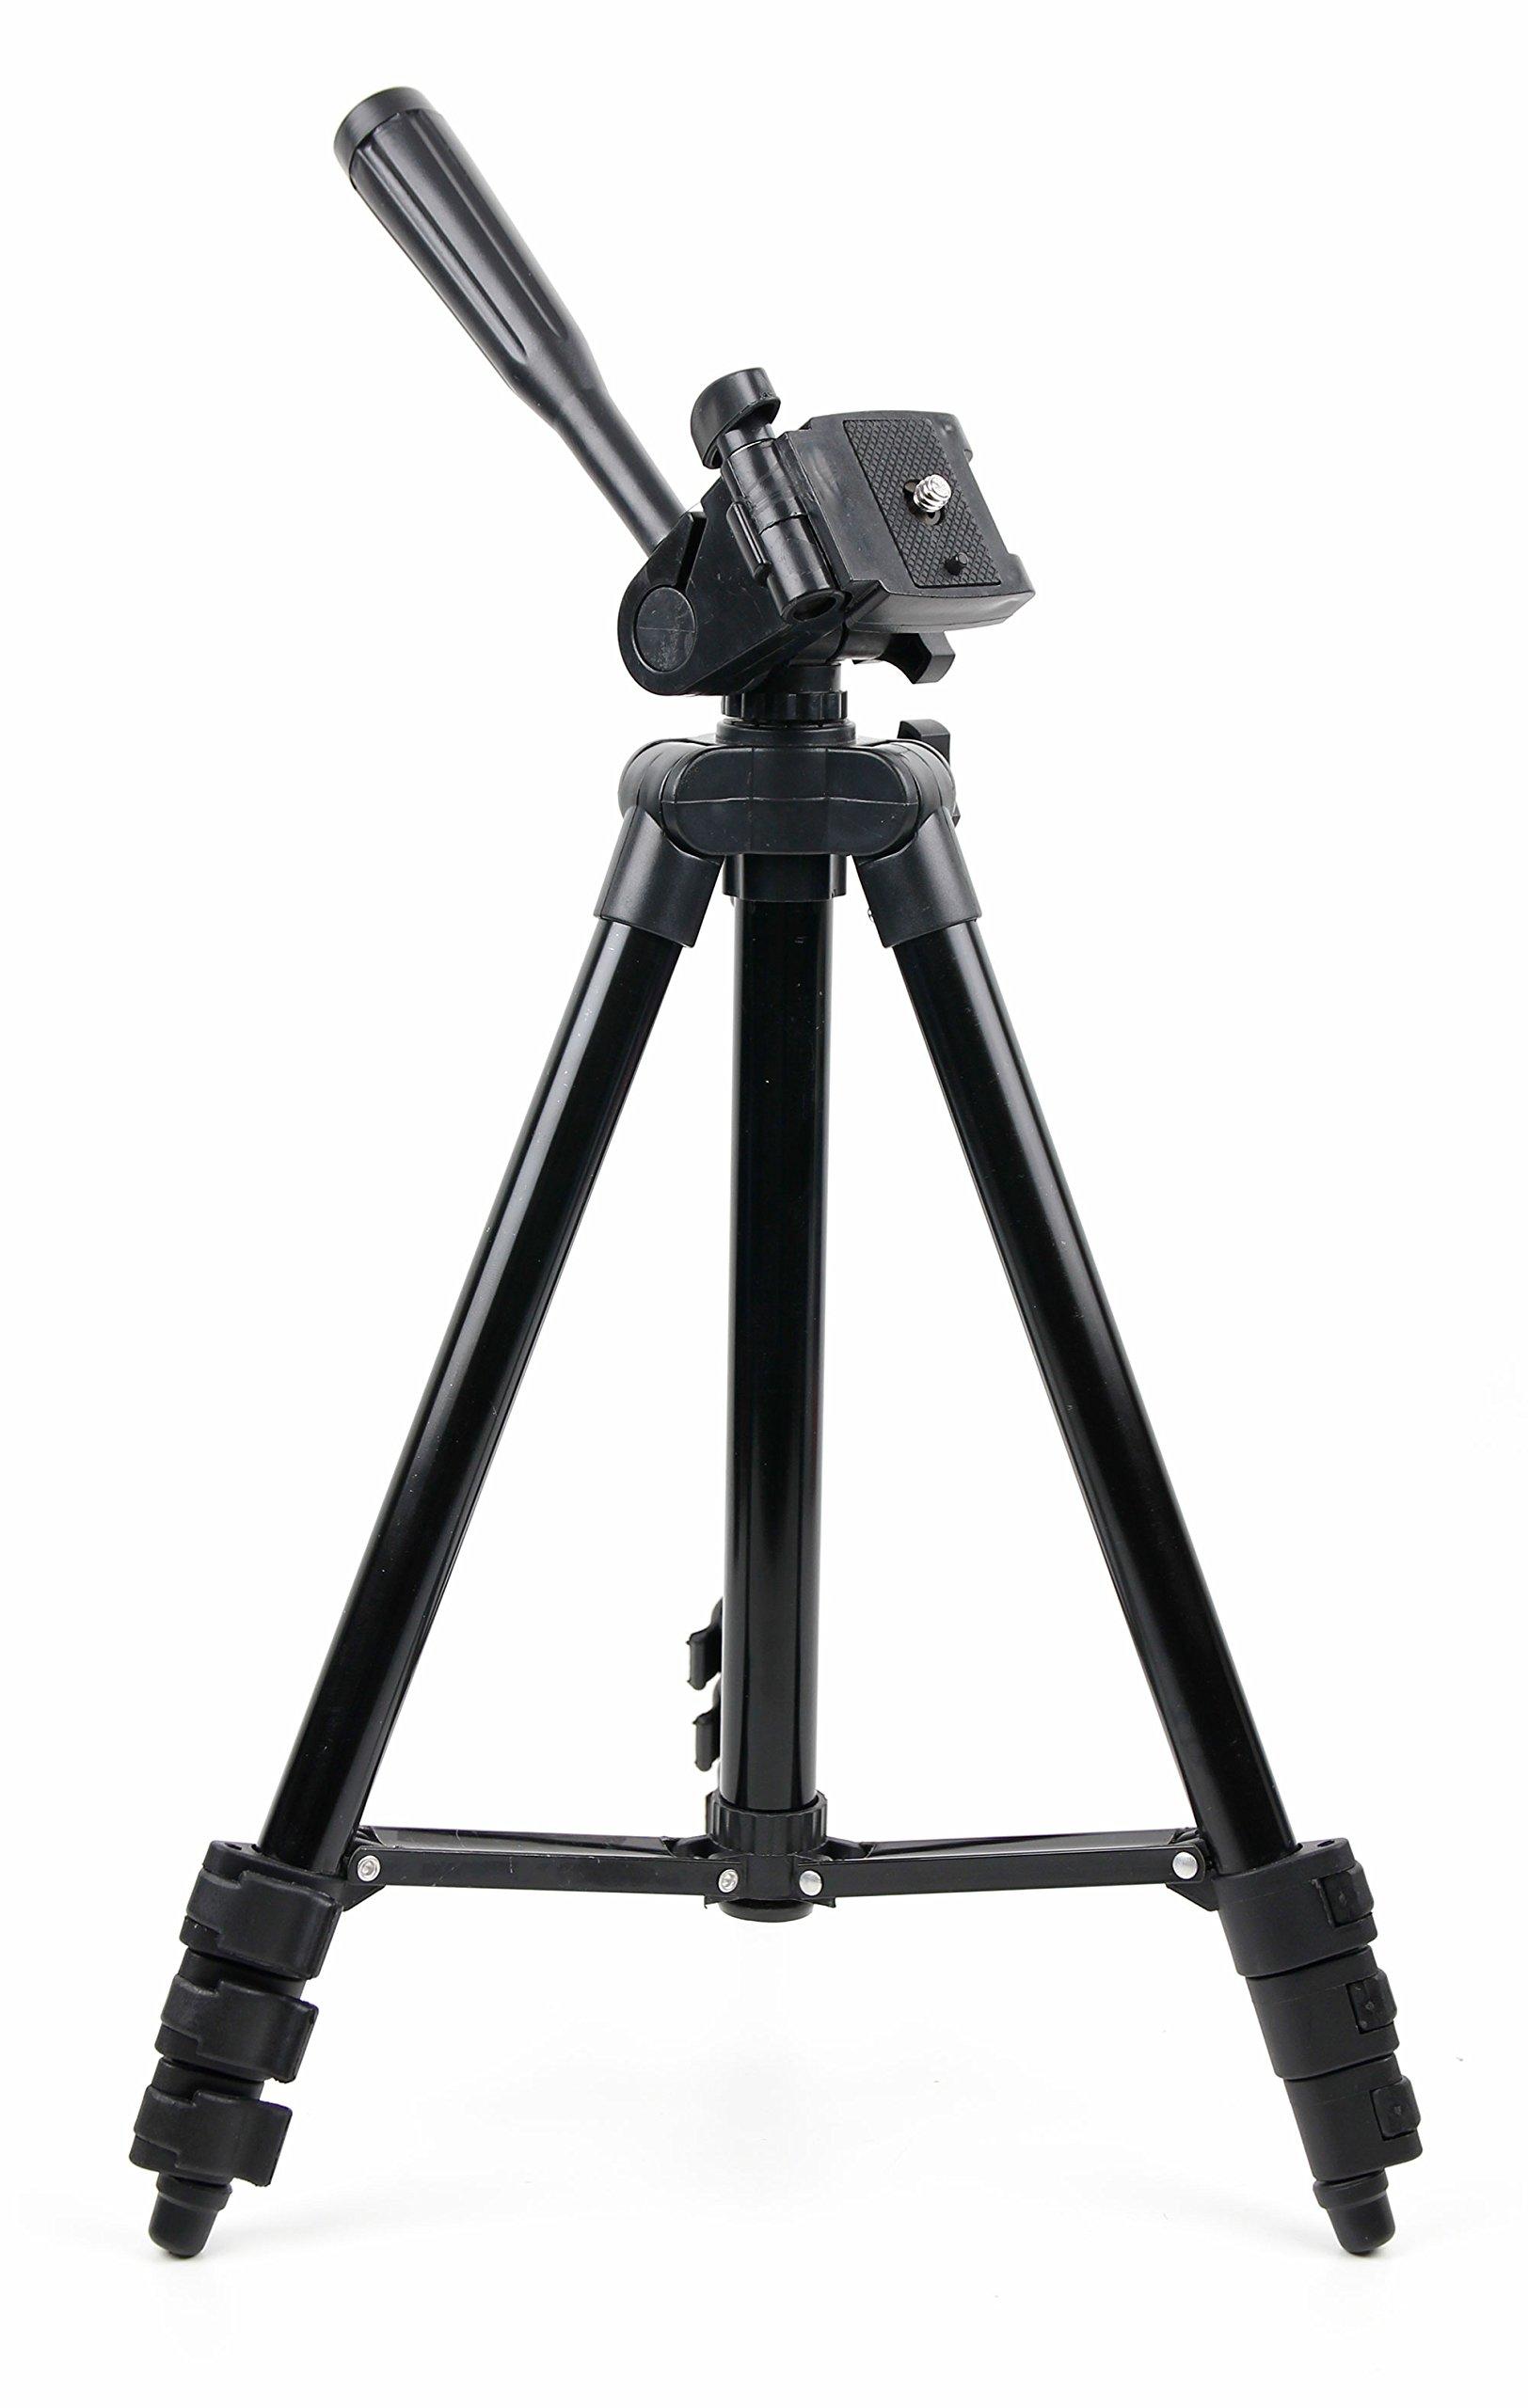 DURAGADGET 1M Extendable Portable Aluminium Tripod with Screw Mount for the Uvistar Wireless WiFi Home Cinema Multimedia Projector